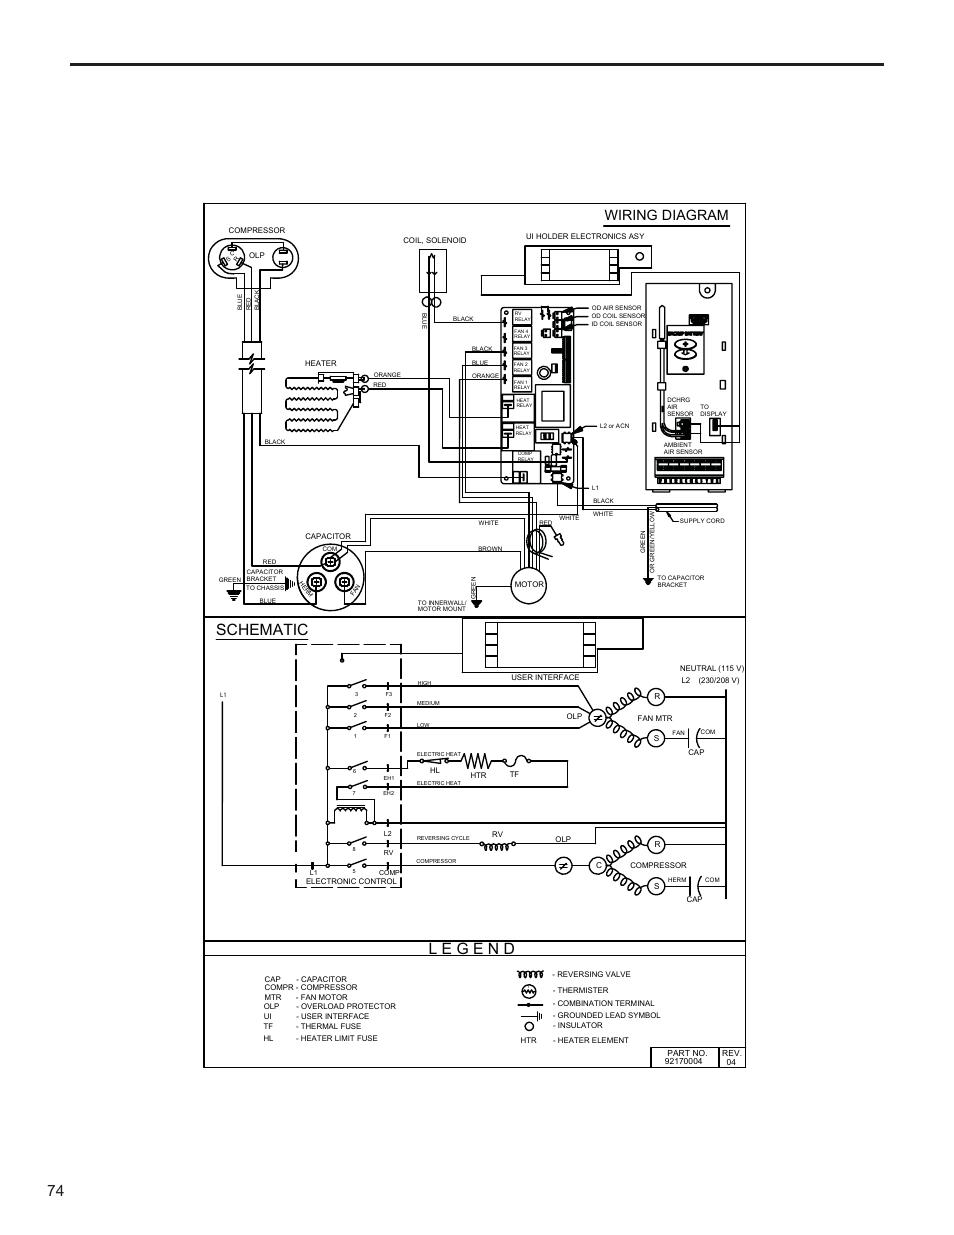 medium resolution of olp wiring diagram wiring diagram metawrg 1757 olp wiring diagram olp wiring diagram